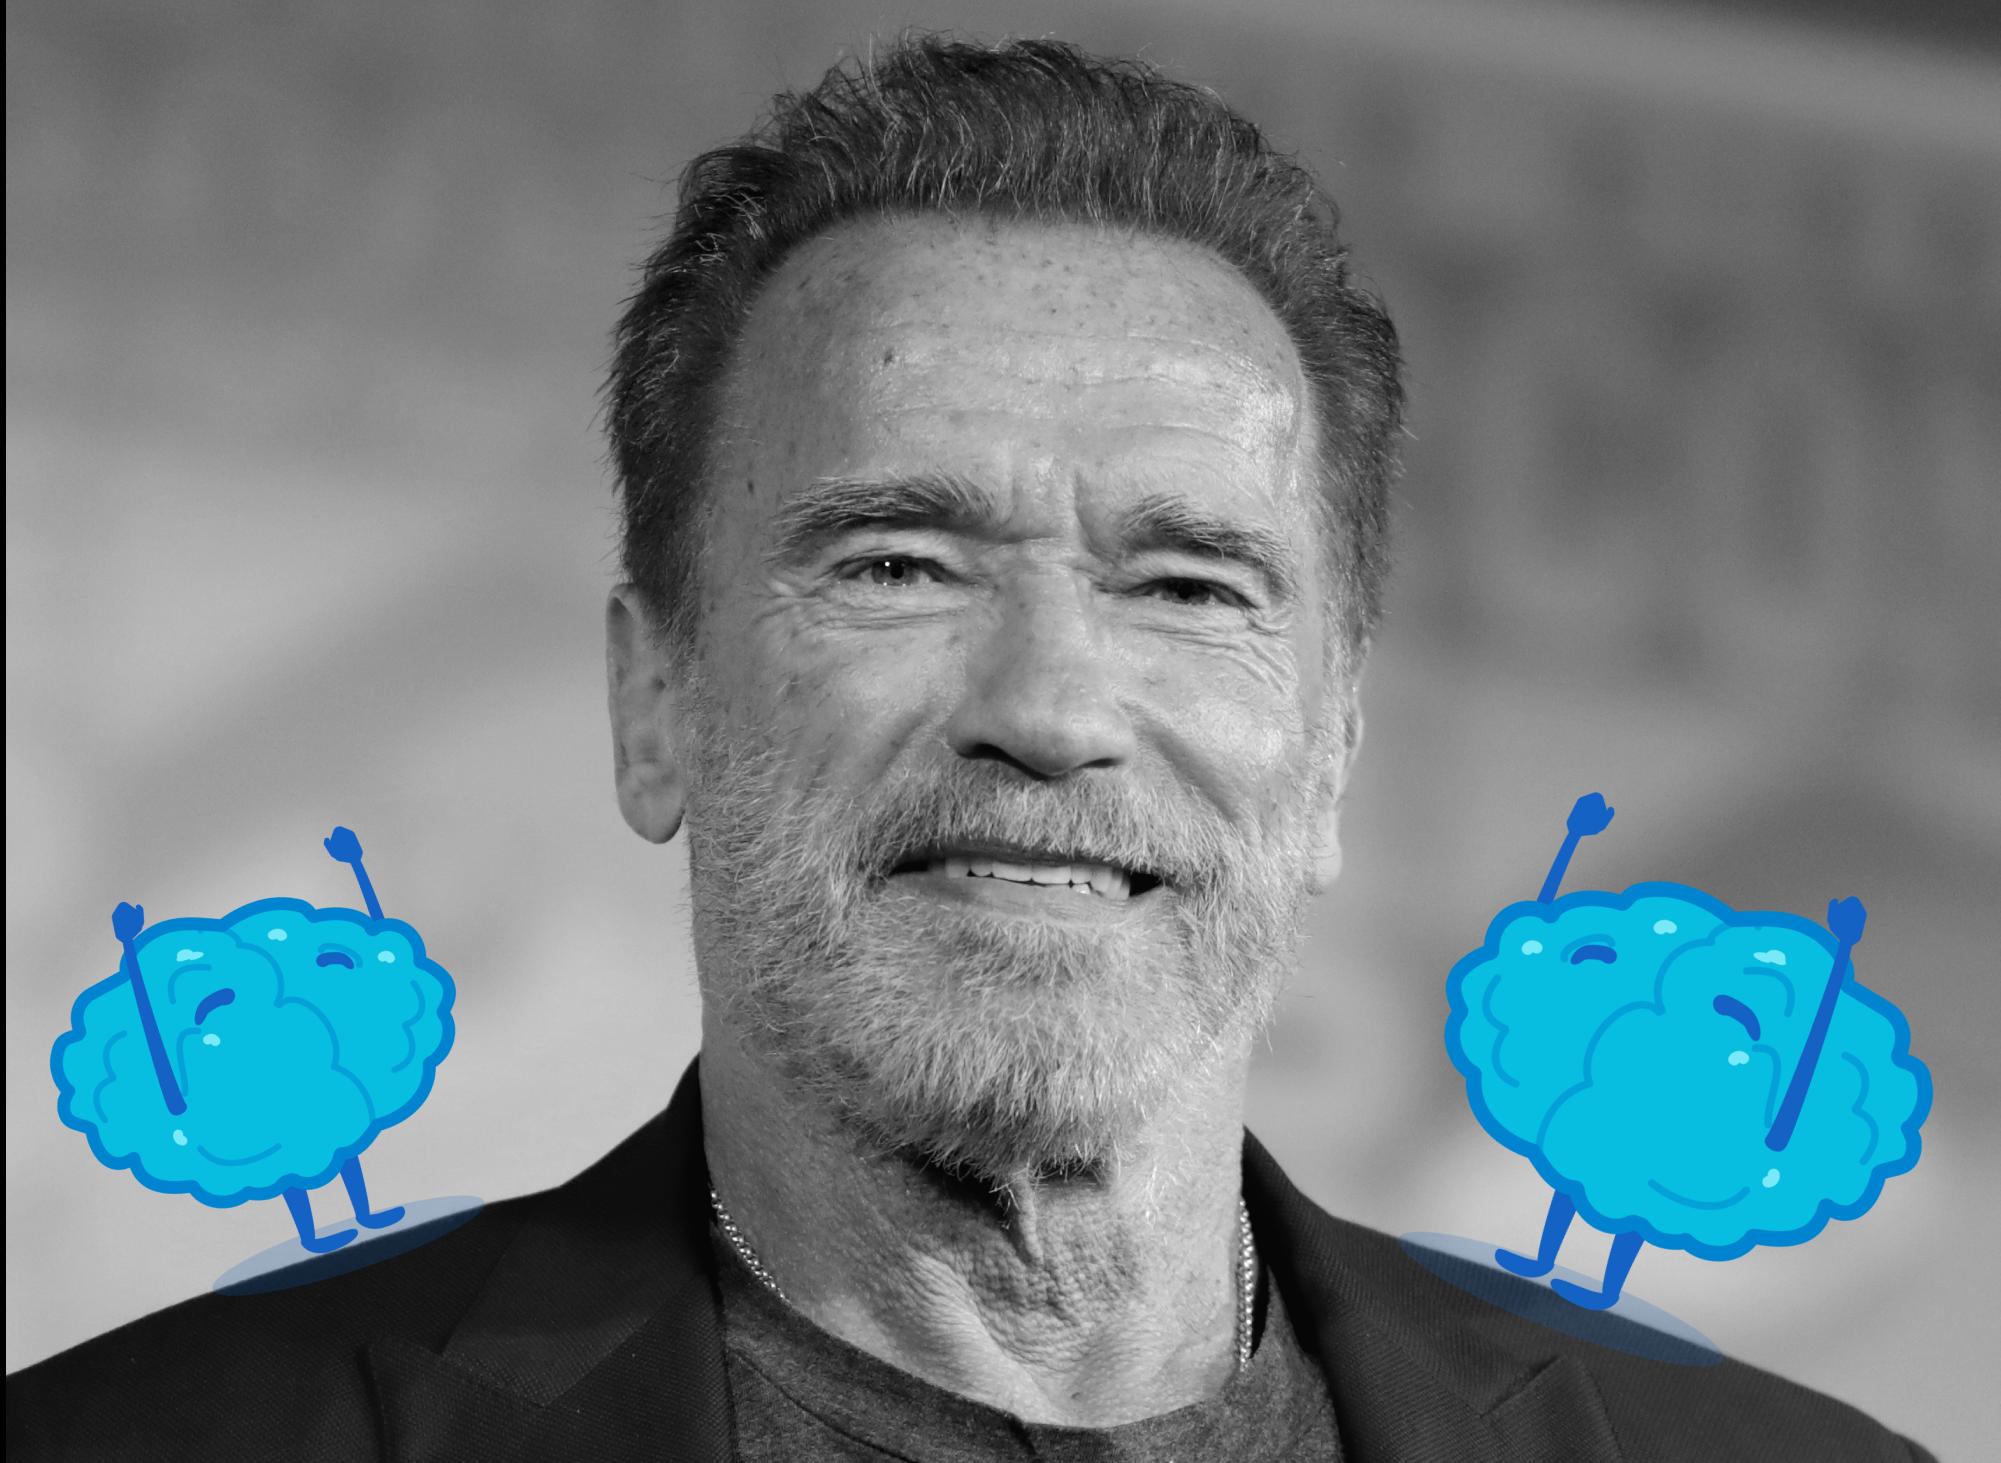 255 Ways to Spell Schwarzenegger (According to Water Cooler Trivia Participants)